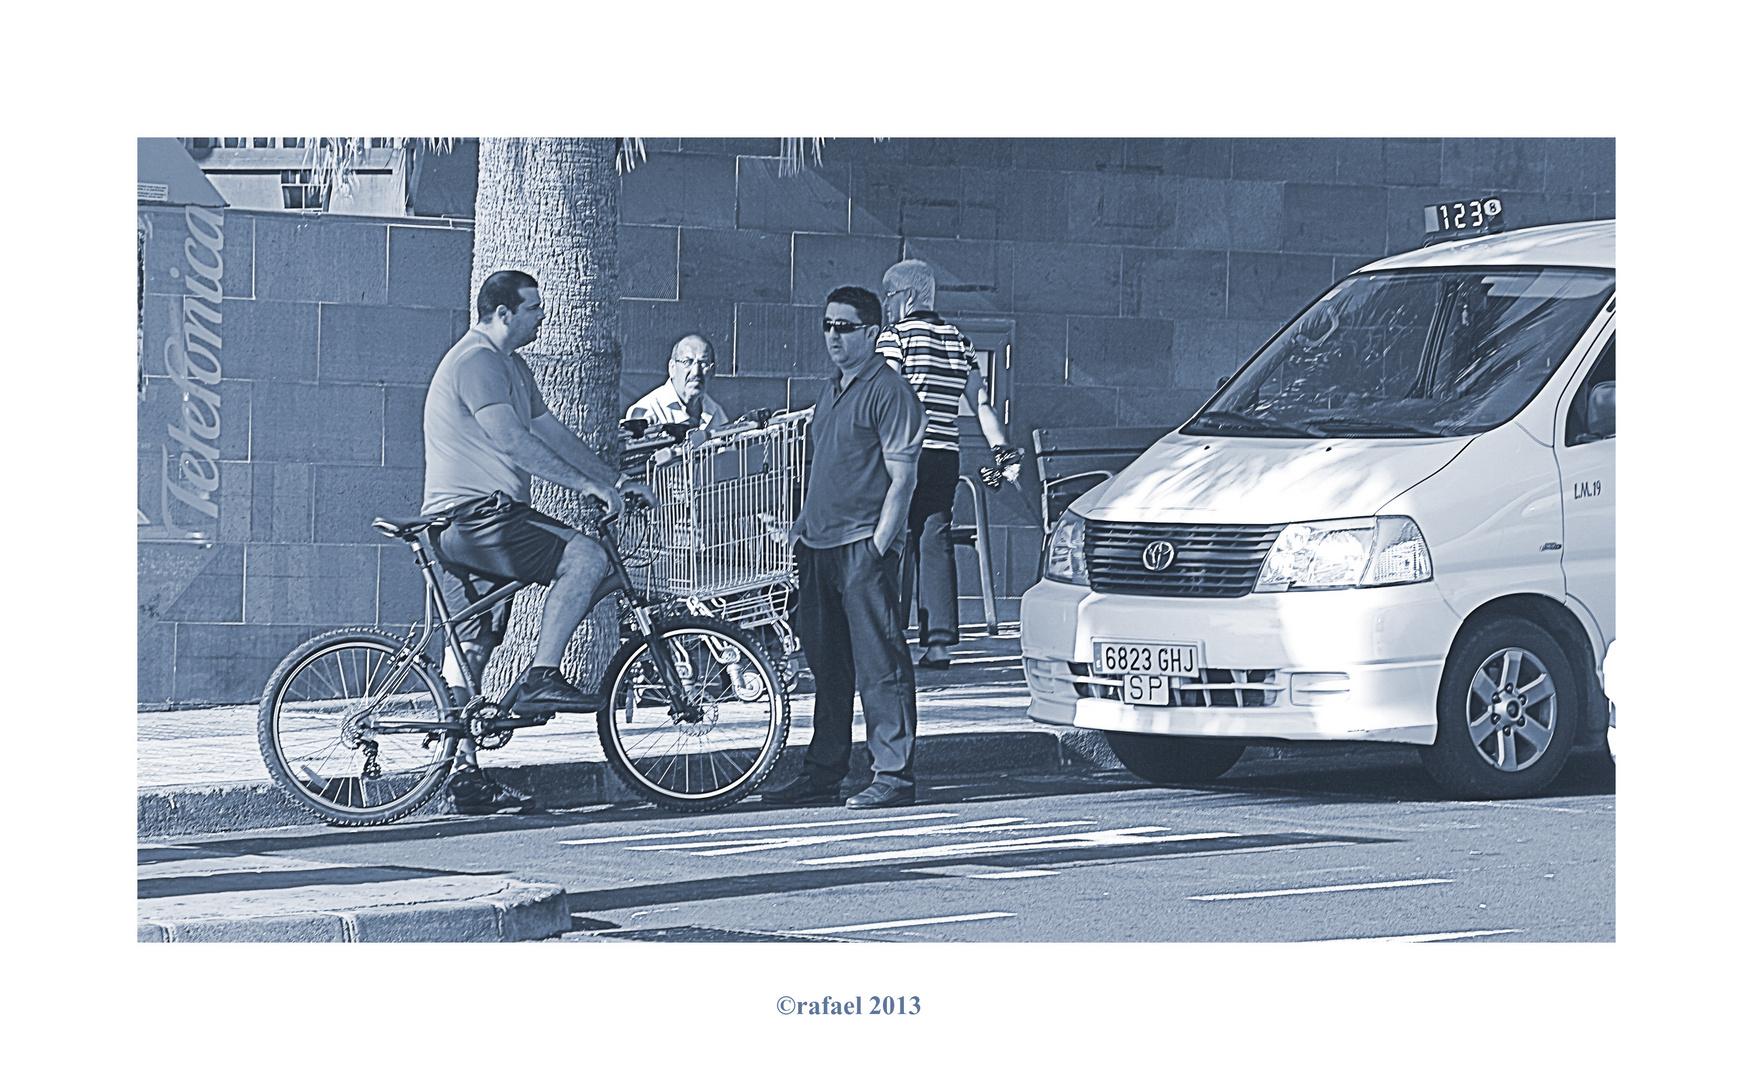 Parado con bici